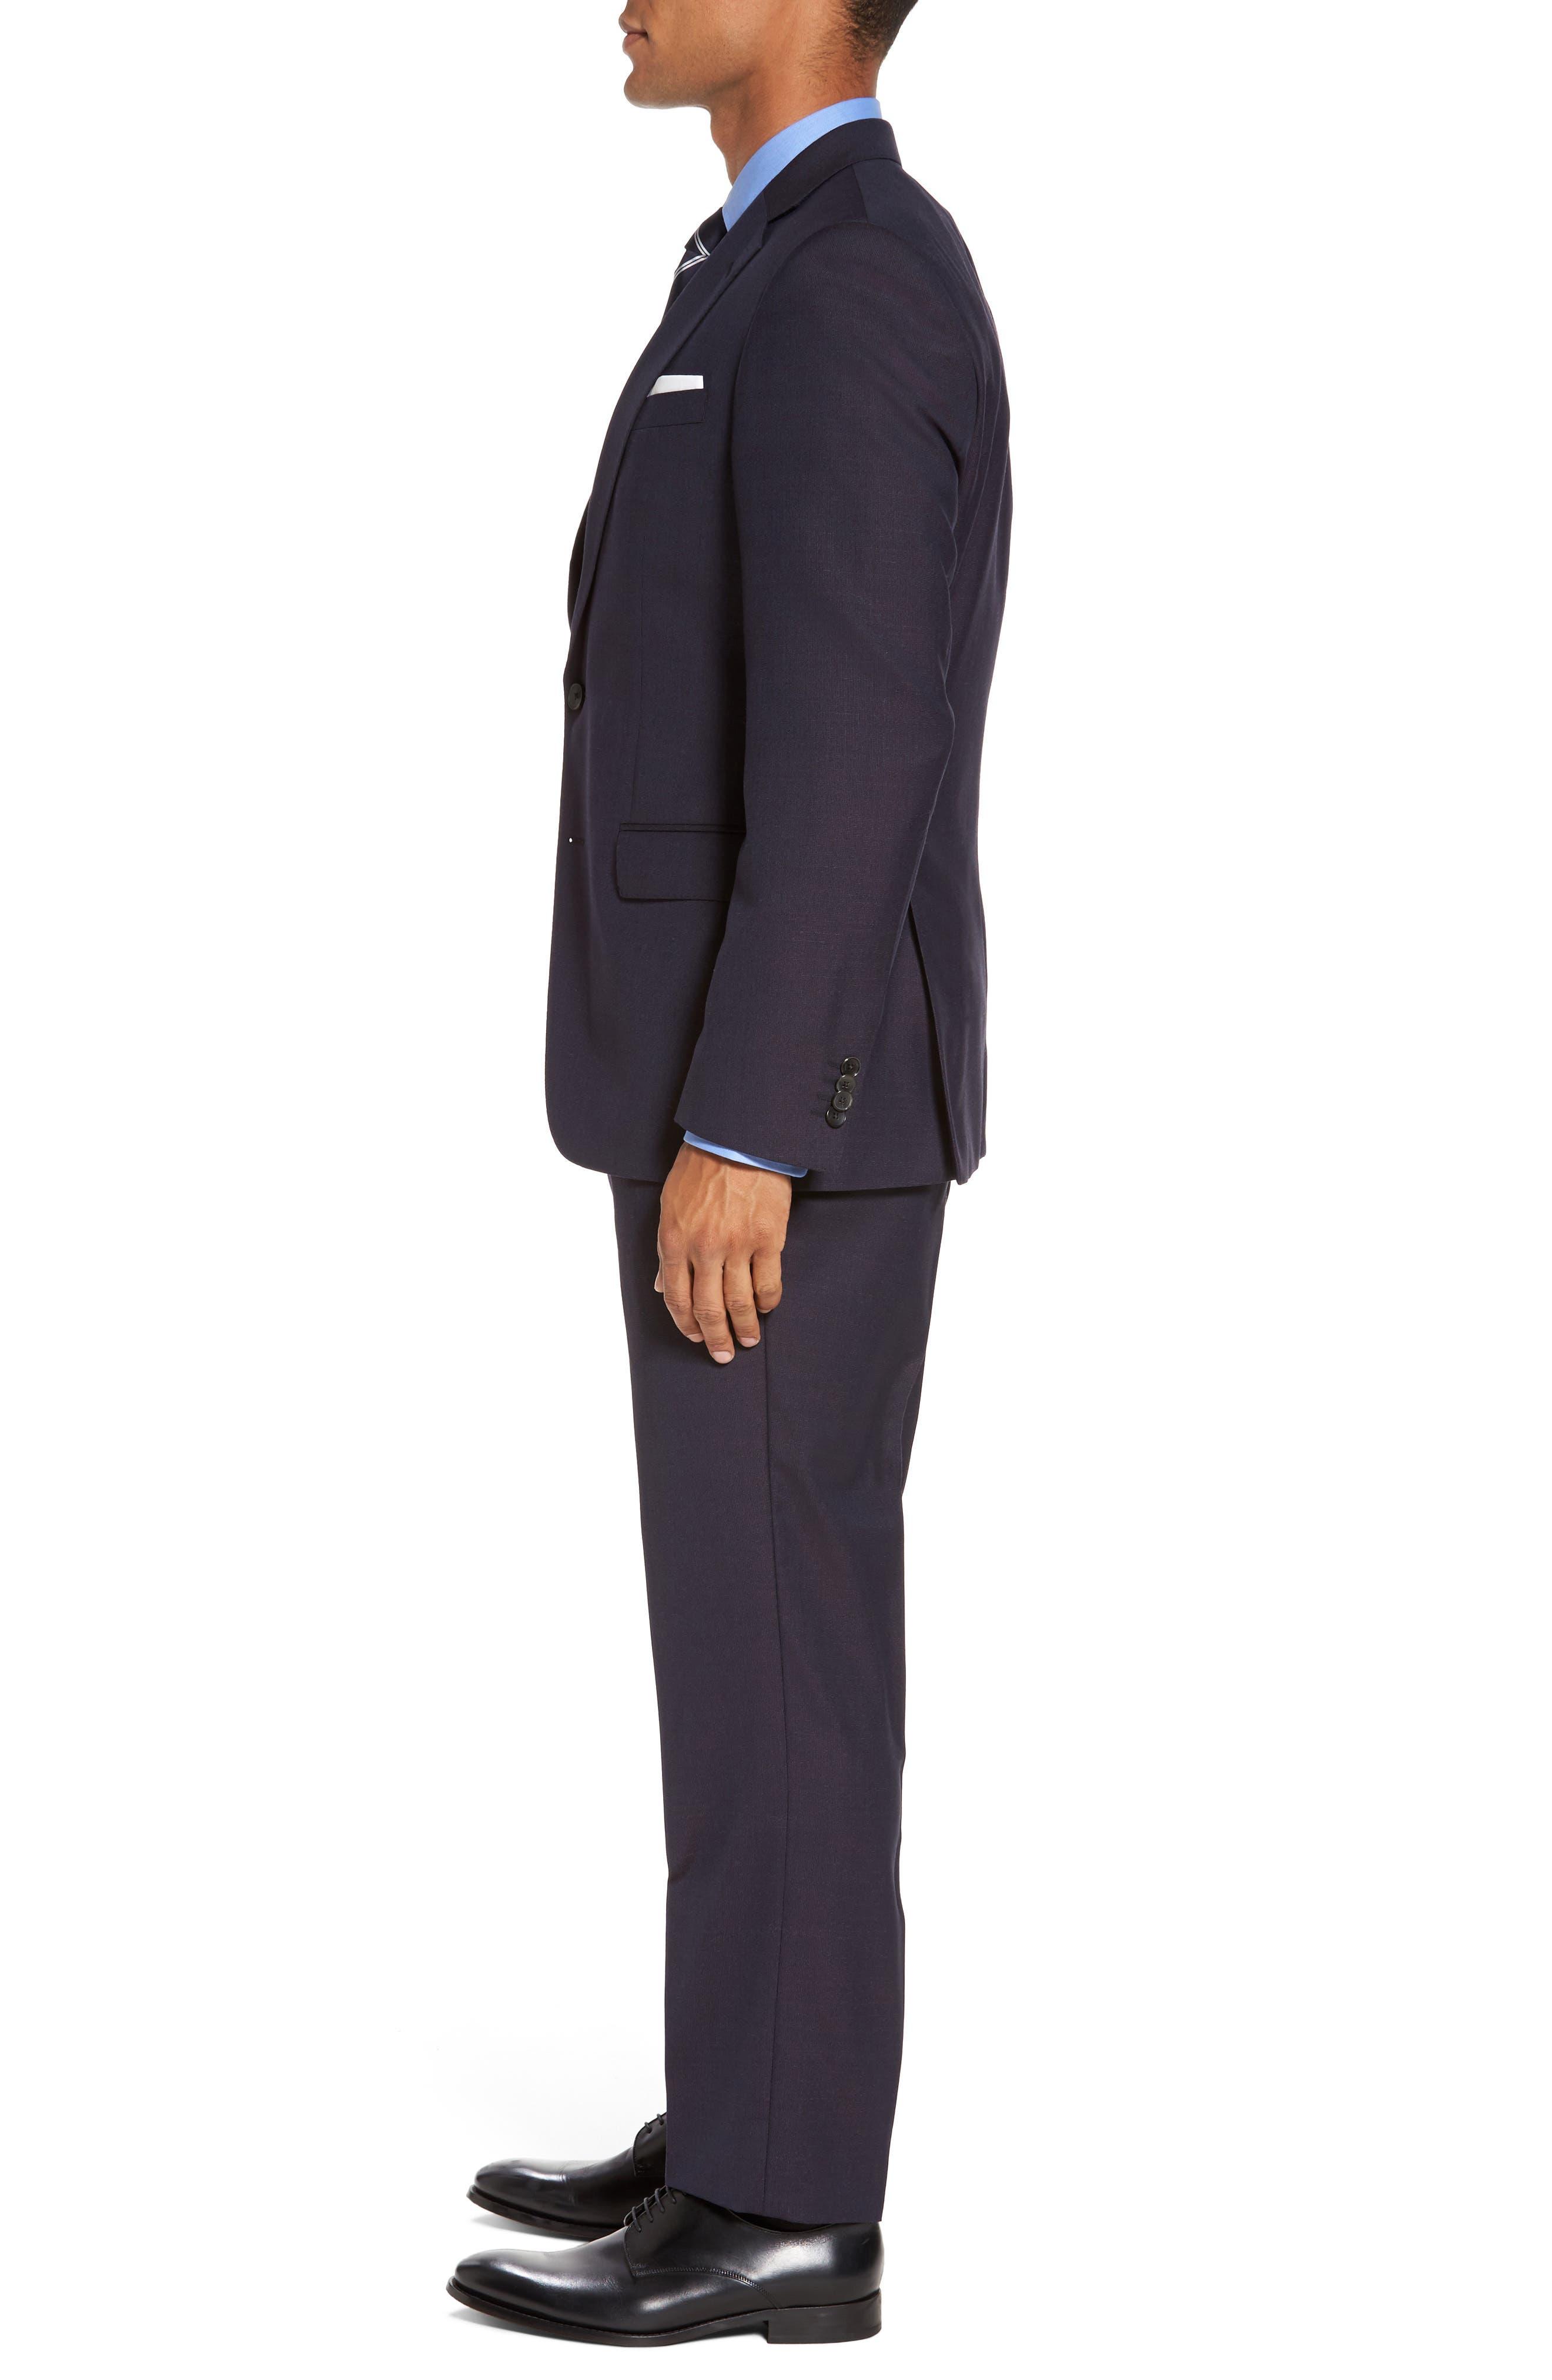 Huge/Genius Trim Fit Wool Suit,                             Alternate thumbnail 3, color,                             606